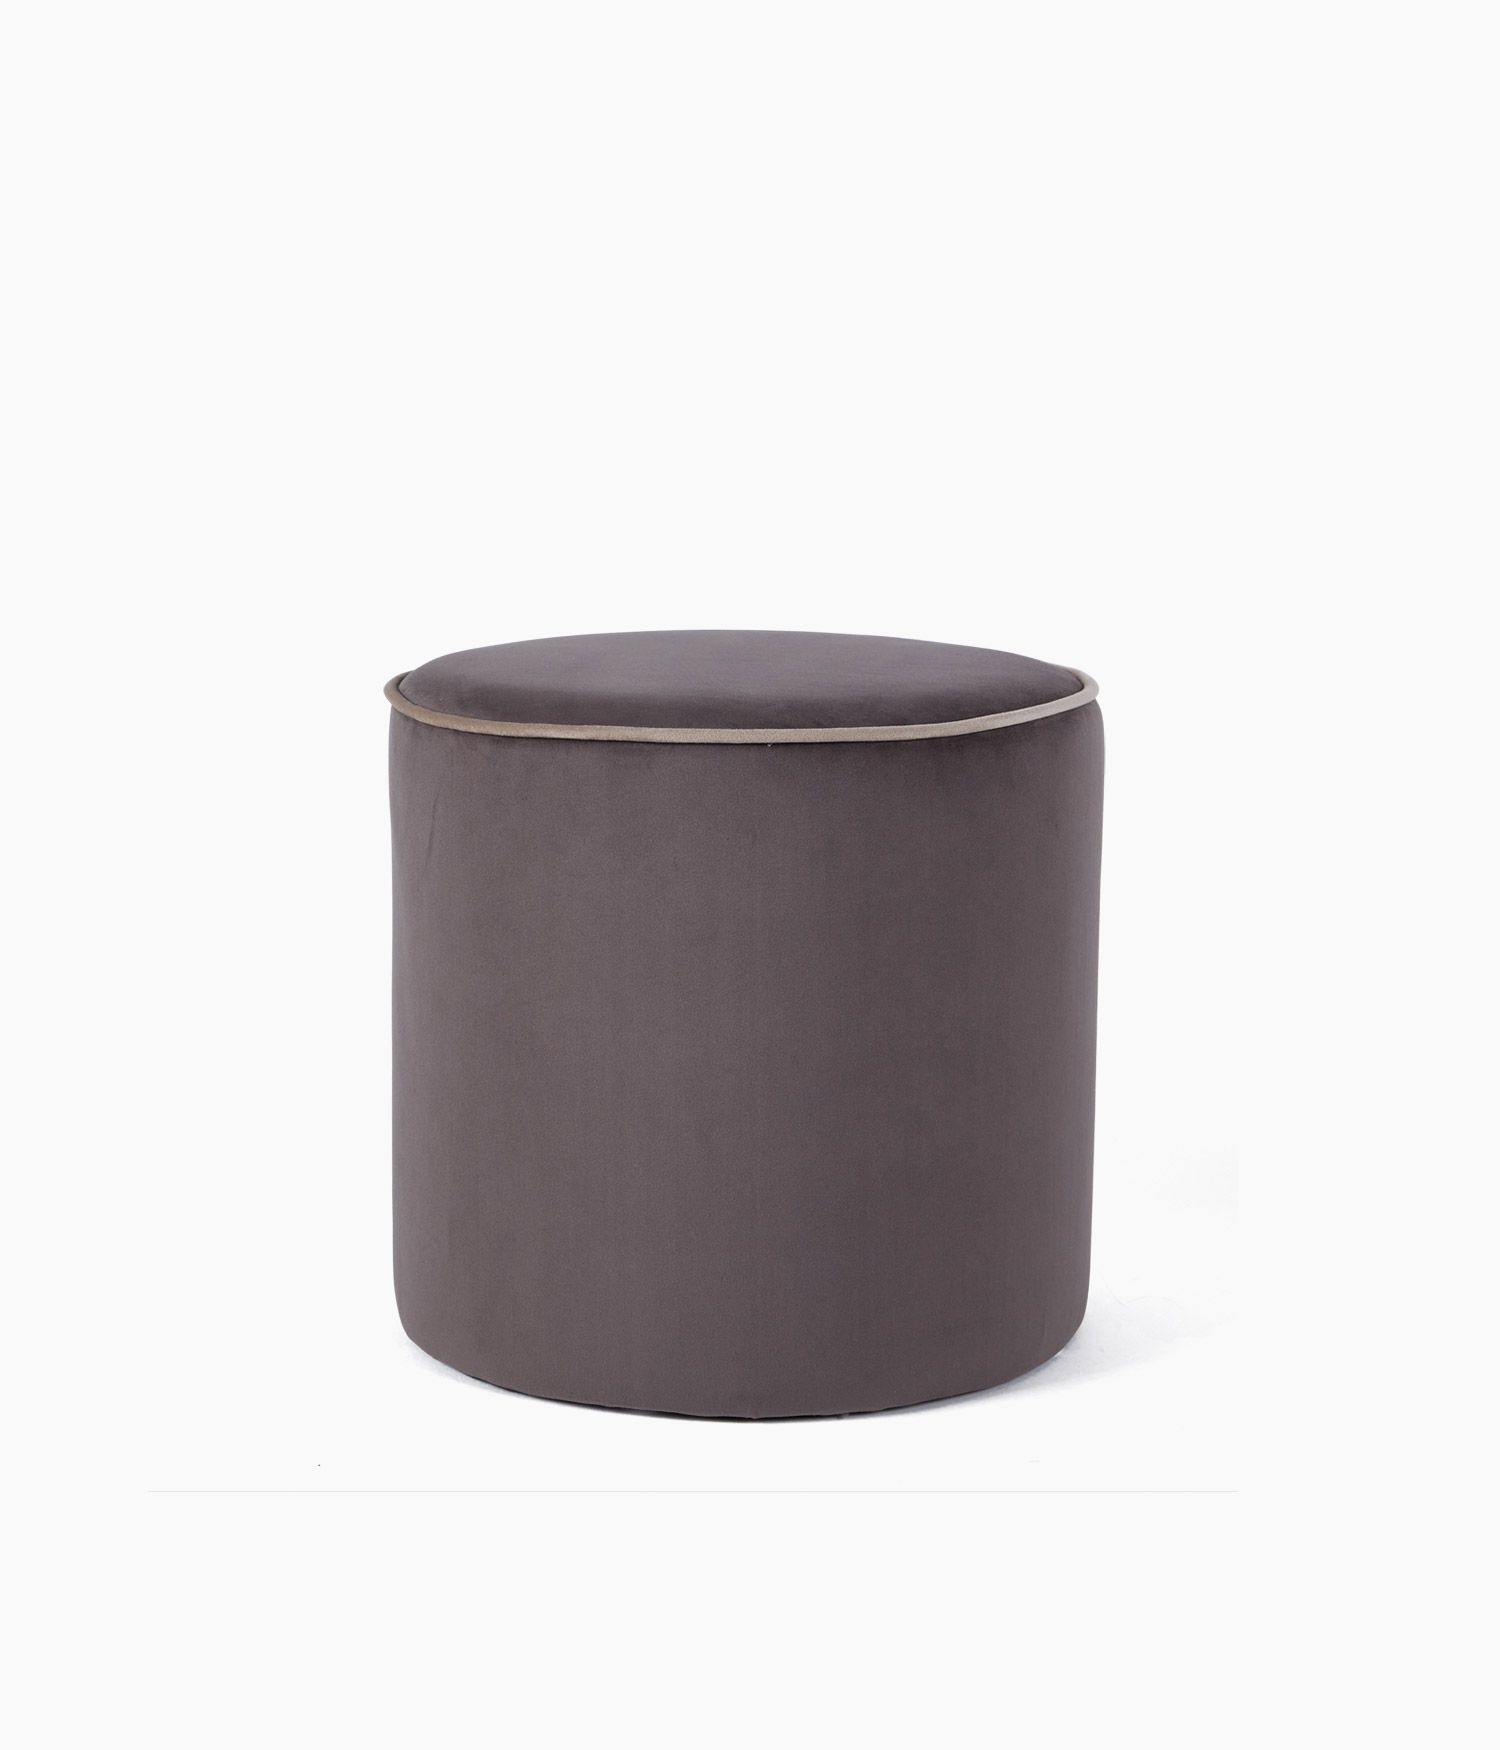 pouf countra marron/beige 40*40